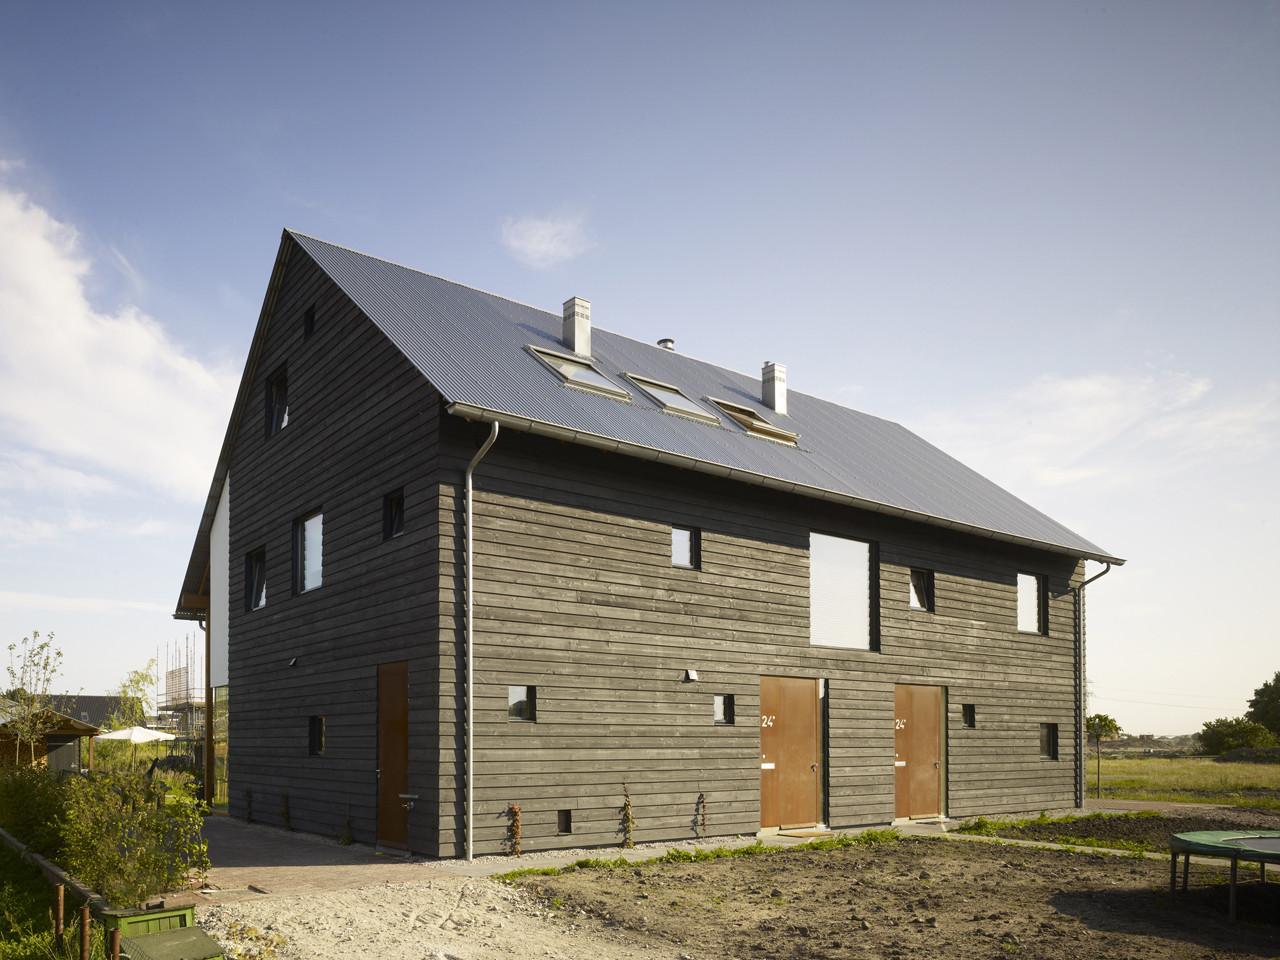 Double Dwelling in Den Hoorn / DP6 Architectuurstudio, © Christian Richters